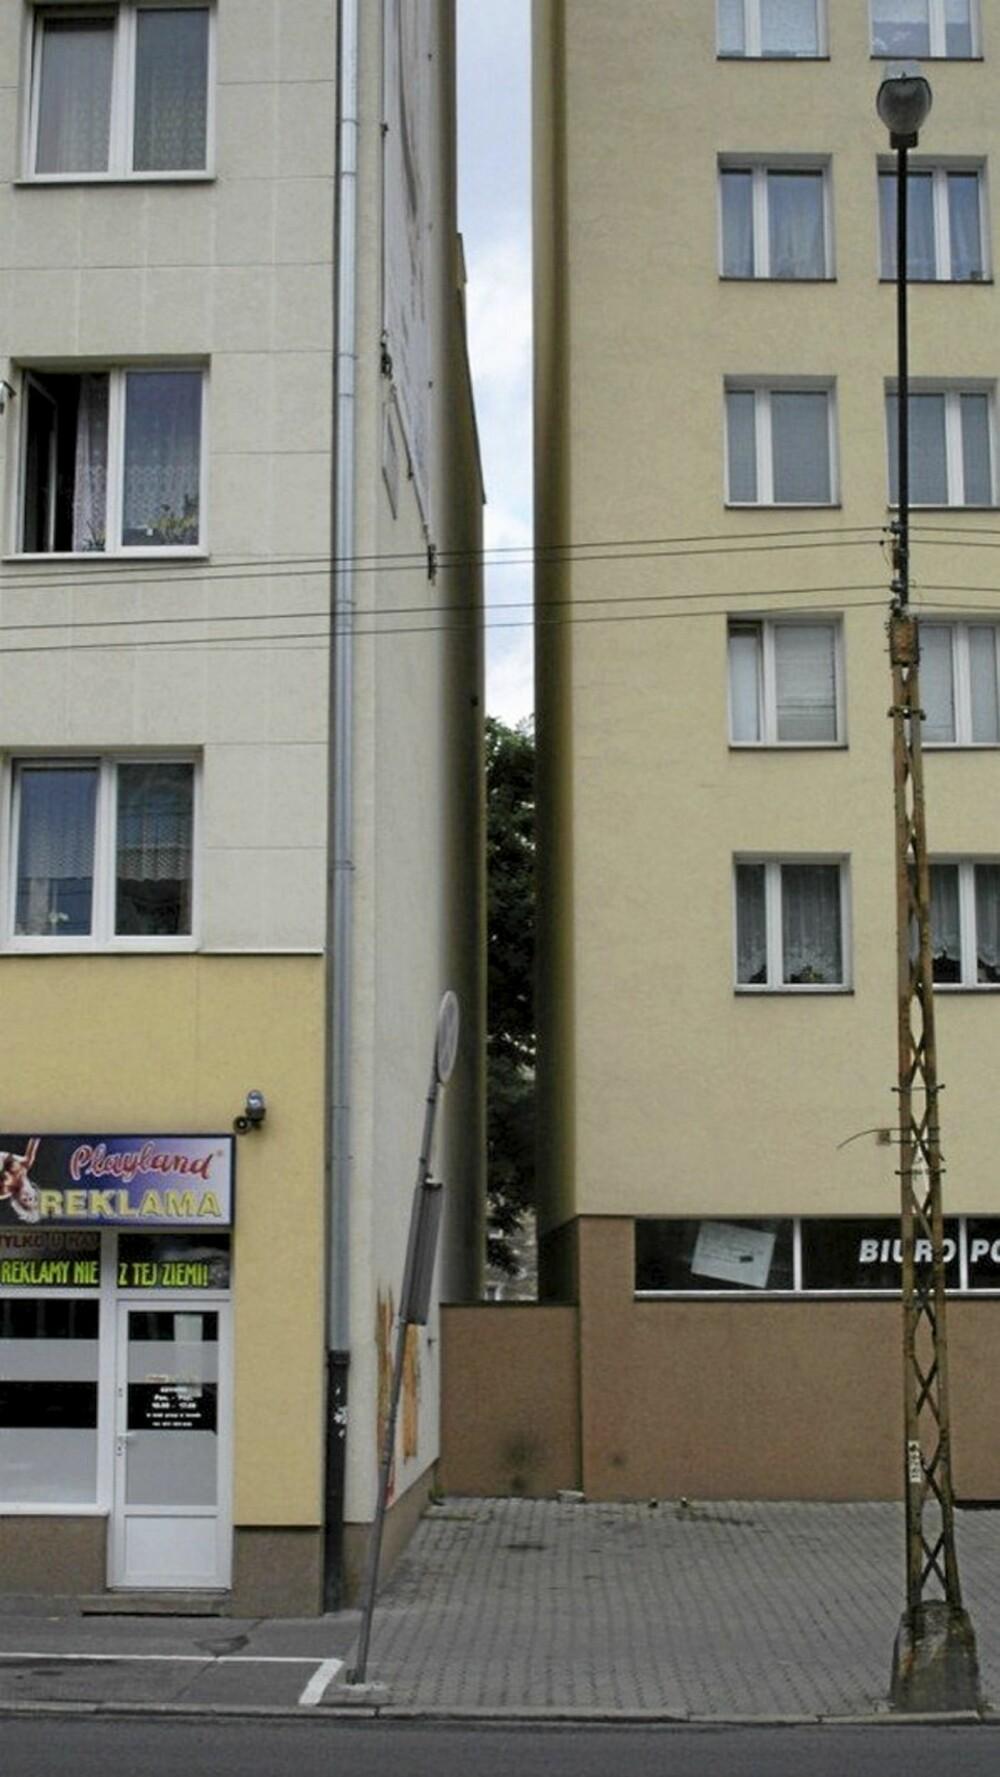 WOLA: I bydelen Wola skal det omtalte huset på plass mellom to andre byhus.